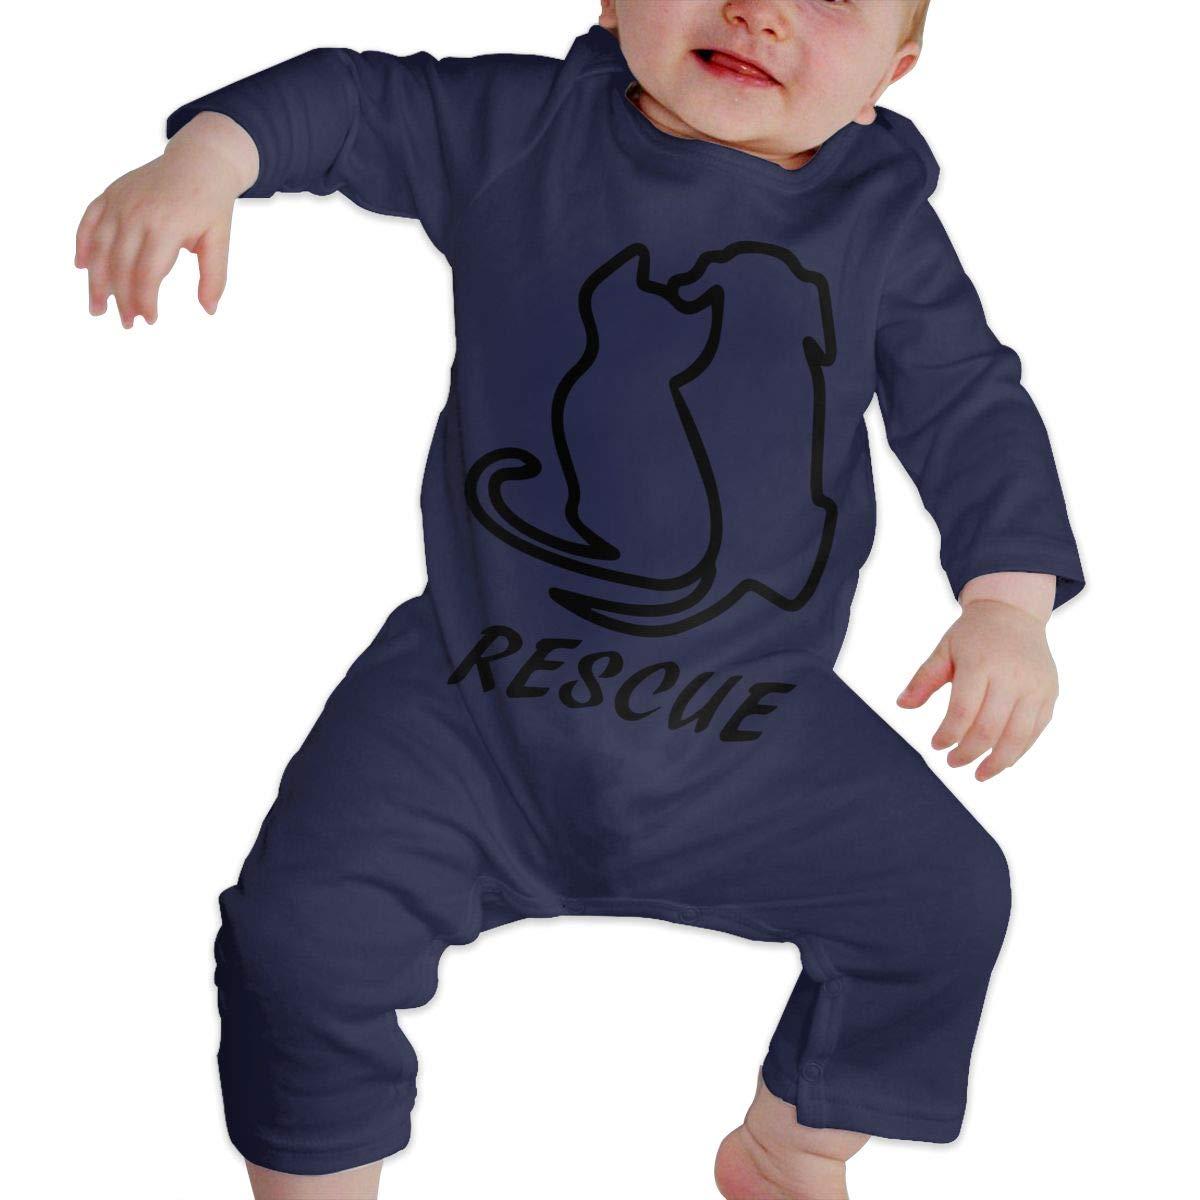 Dog Rescue Newborn Kids Long Sleeve Bodysuit Baby Rompers